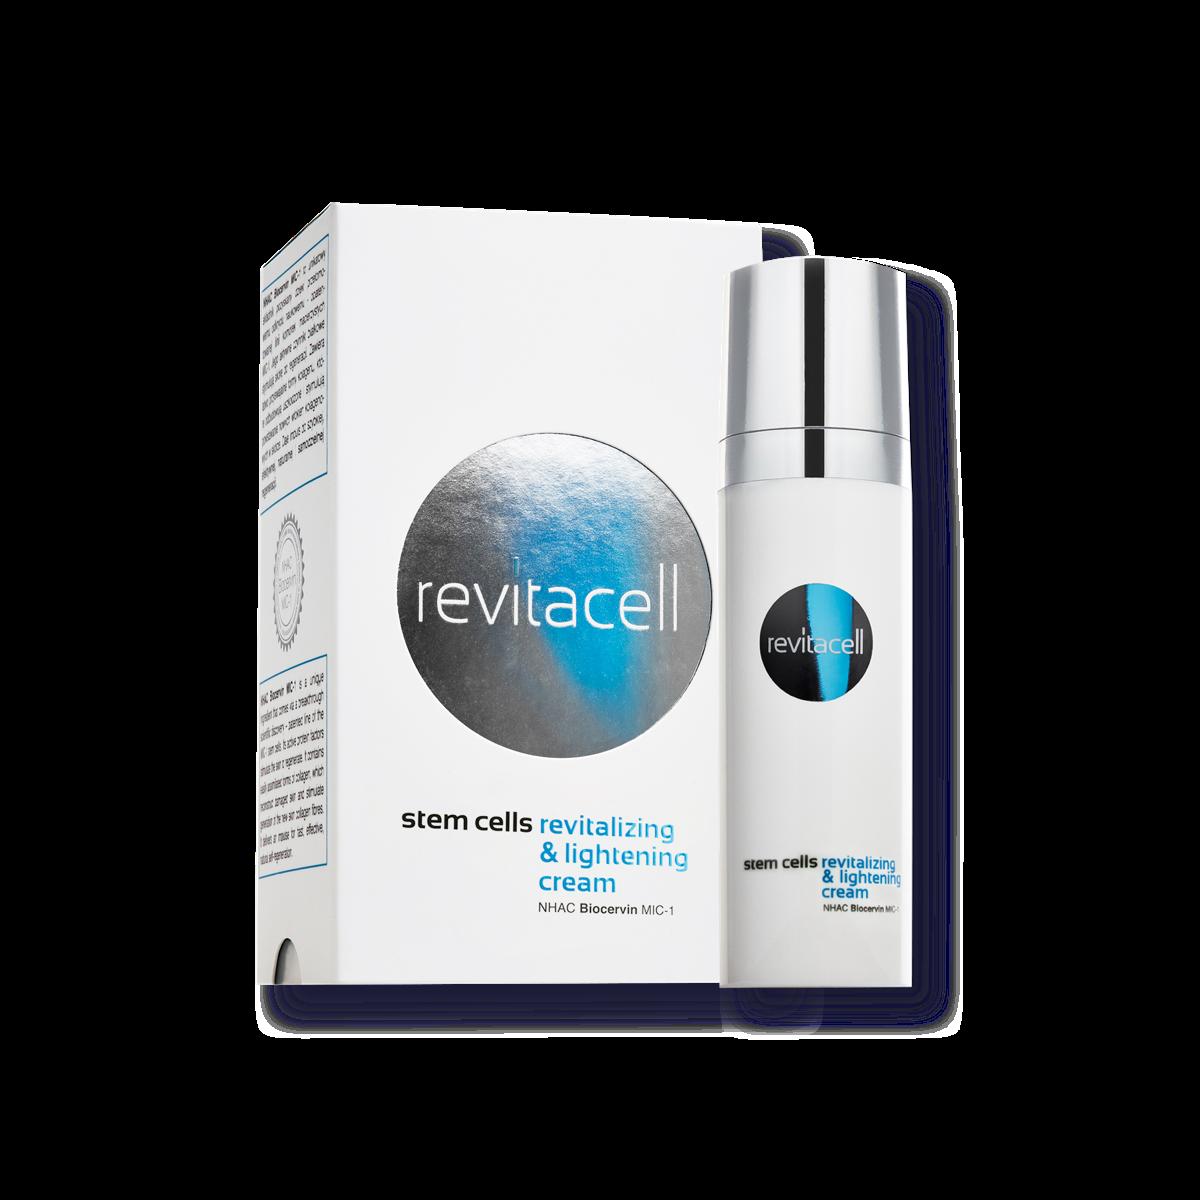 Revitalizing & lightening cream